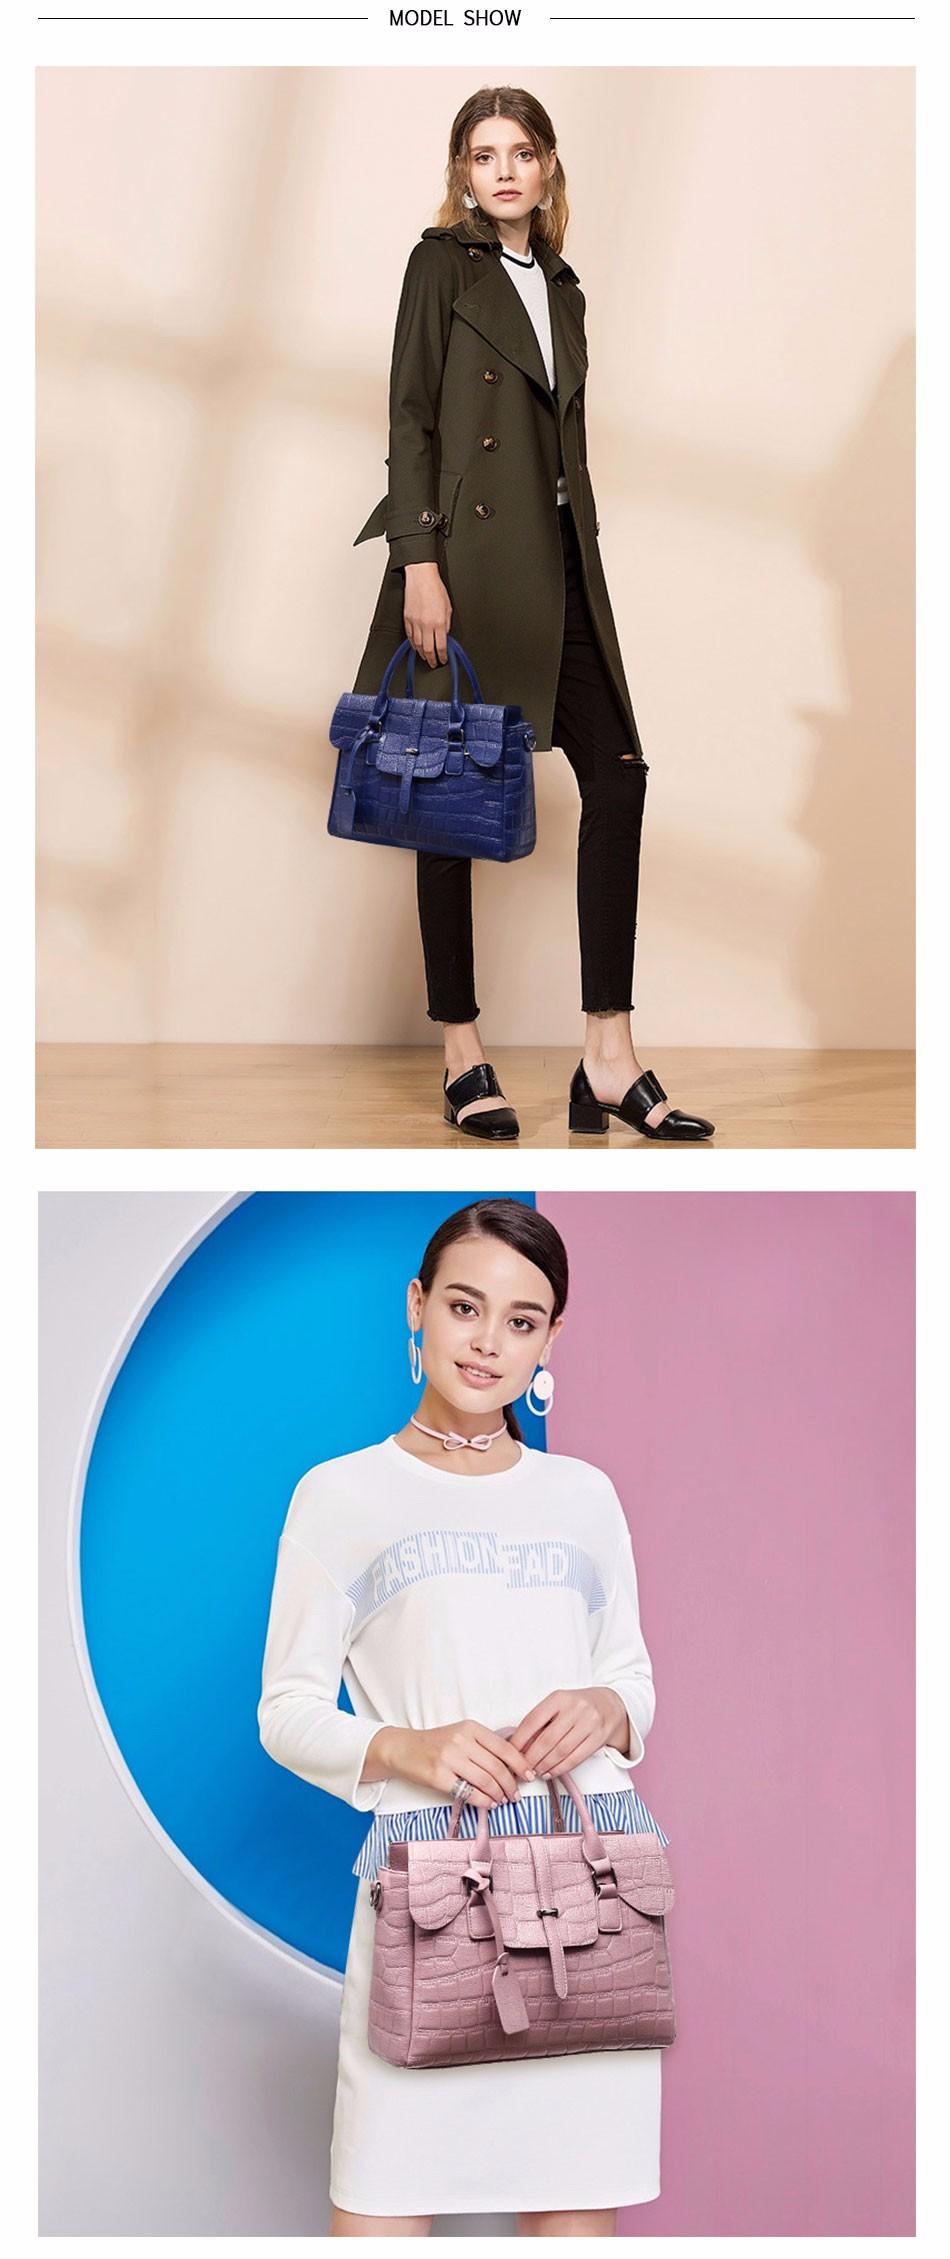 High Quality PU Leather Women's Handbags Shoulder Bag Ladies Hand Bags Stone Casual Women Bag Large Capacity Handbag 17 Sac 9